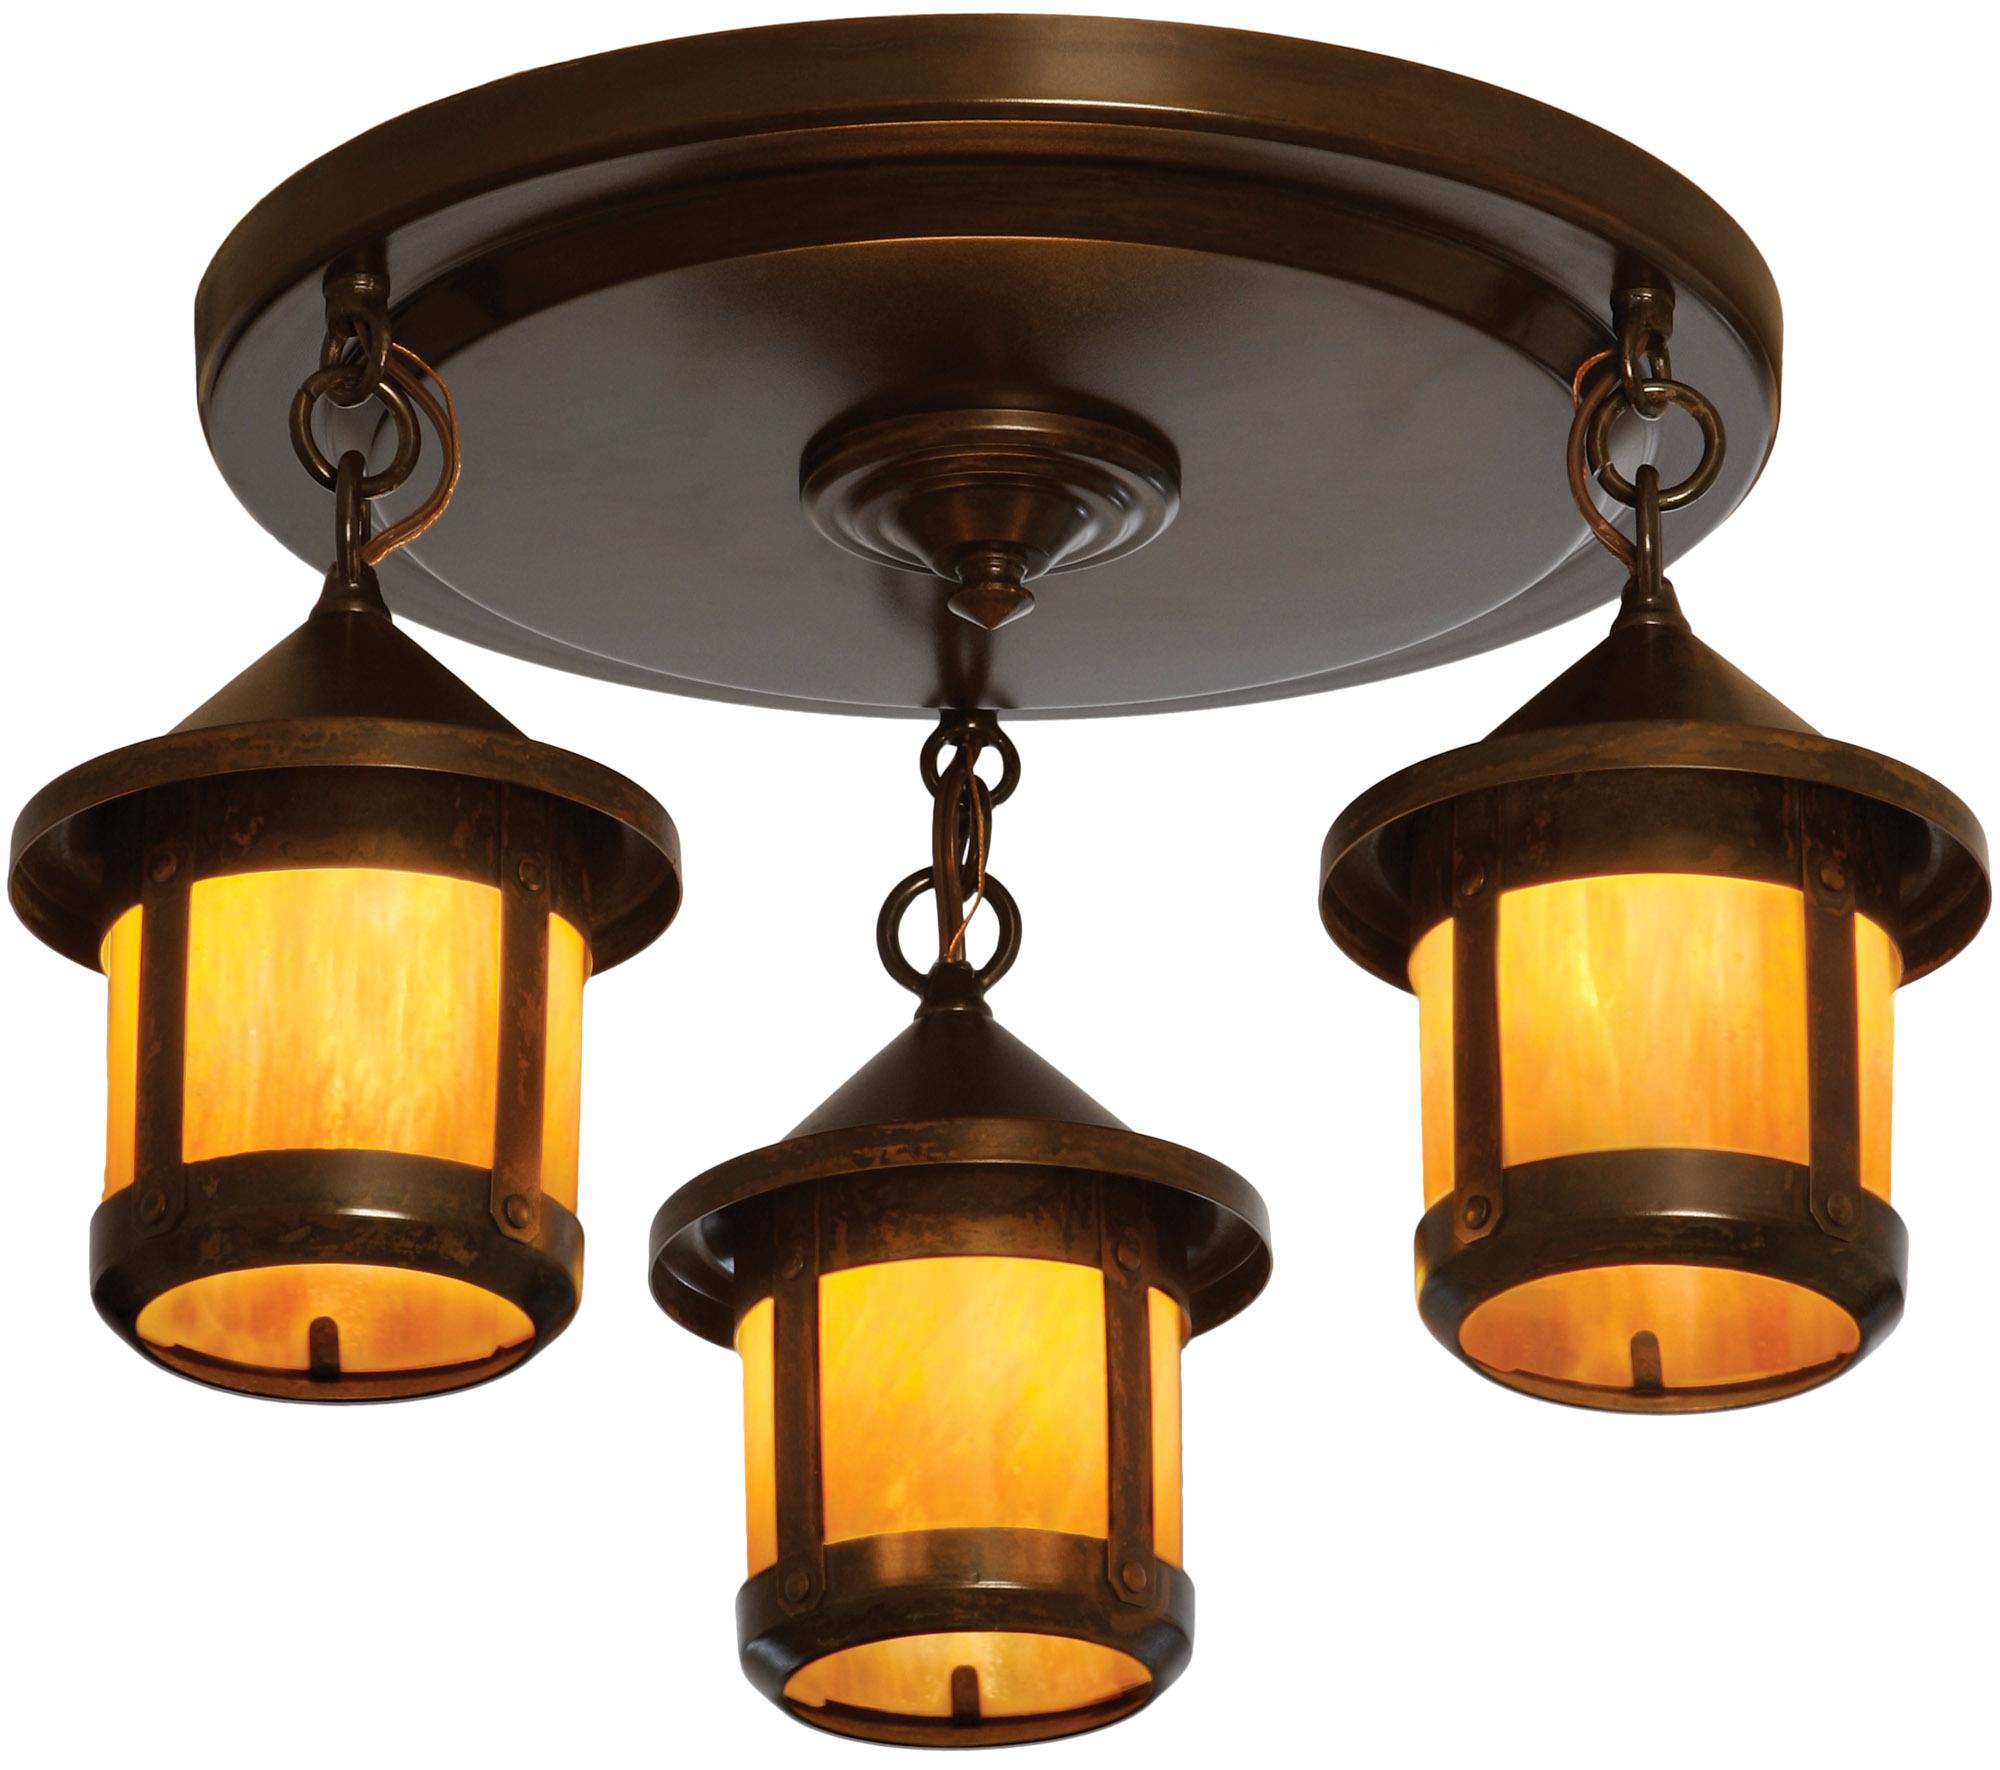 Lighting 1910 to 1930